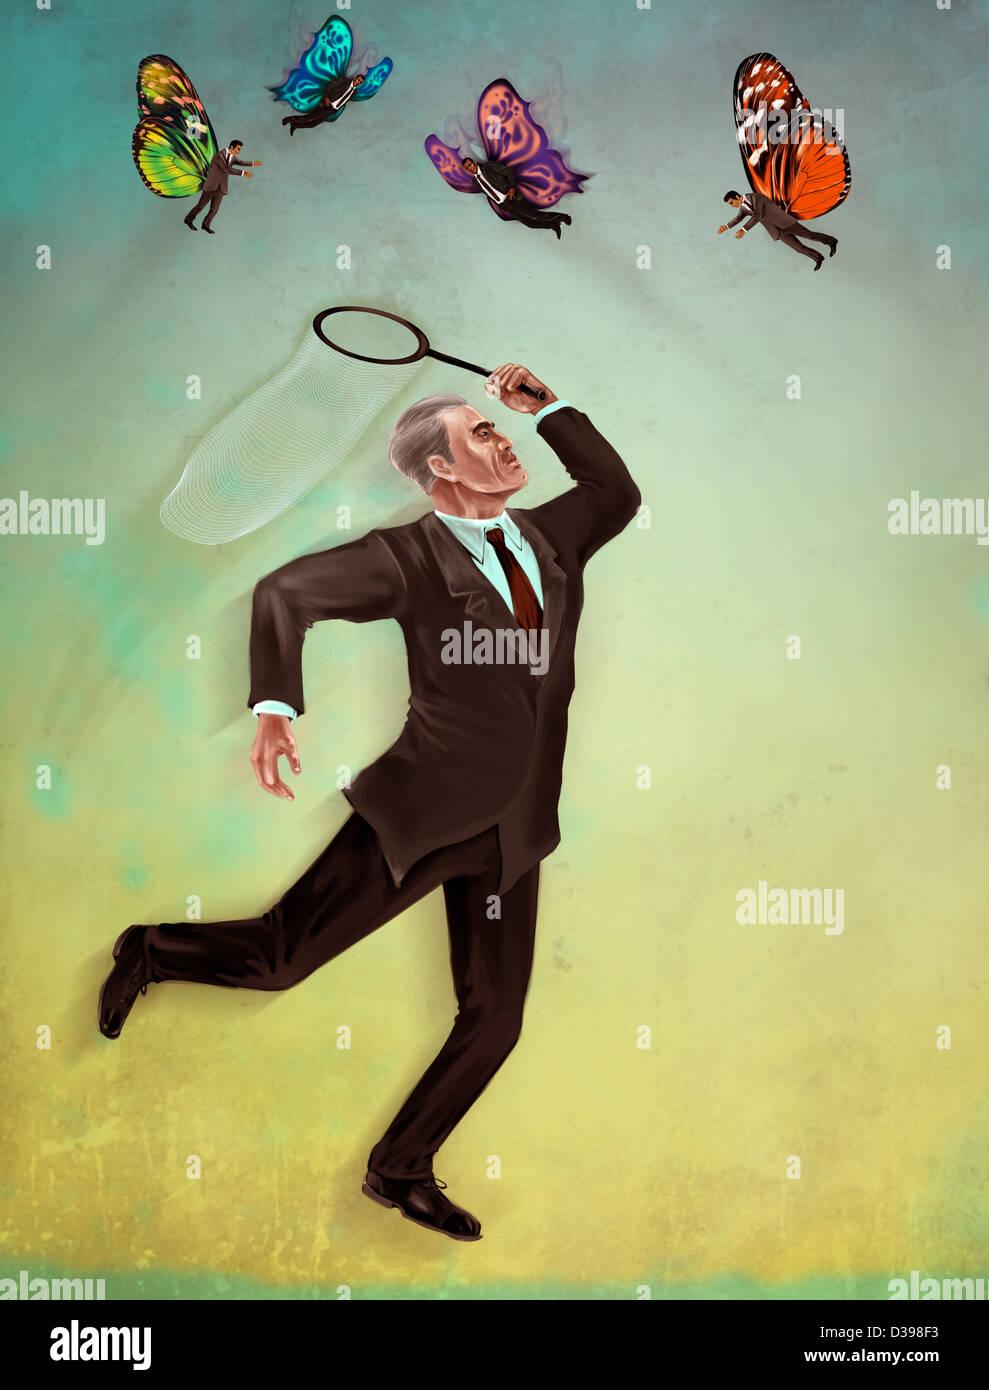 Empresario de negocios con Mariposa neto captura de ejecutivos que representan el concepto de selección Imagen De Stock